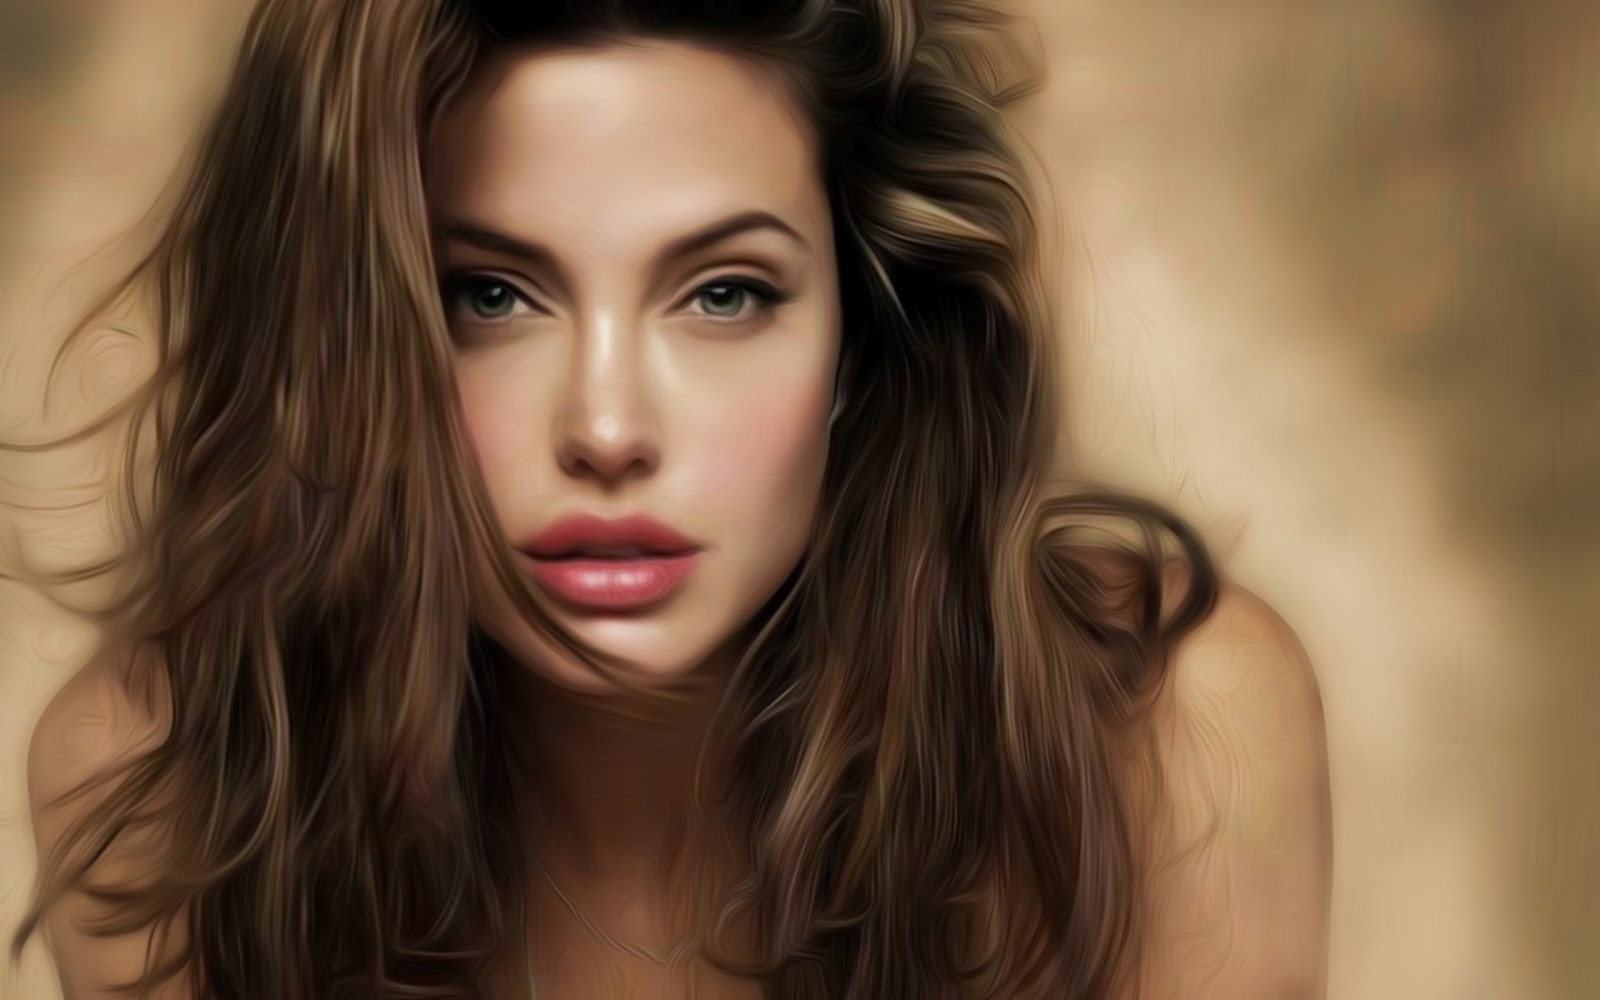 http://3.bp.blogspot.com/-Z7NSJgV8zaI/UORA0UD_65I/AAAAAAAAuPw/9mqnAAQso6A/s1600/Angelina-Jolie-Art.jpg